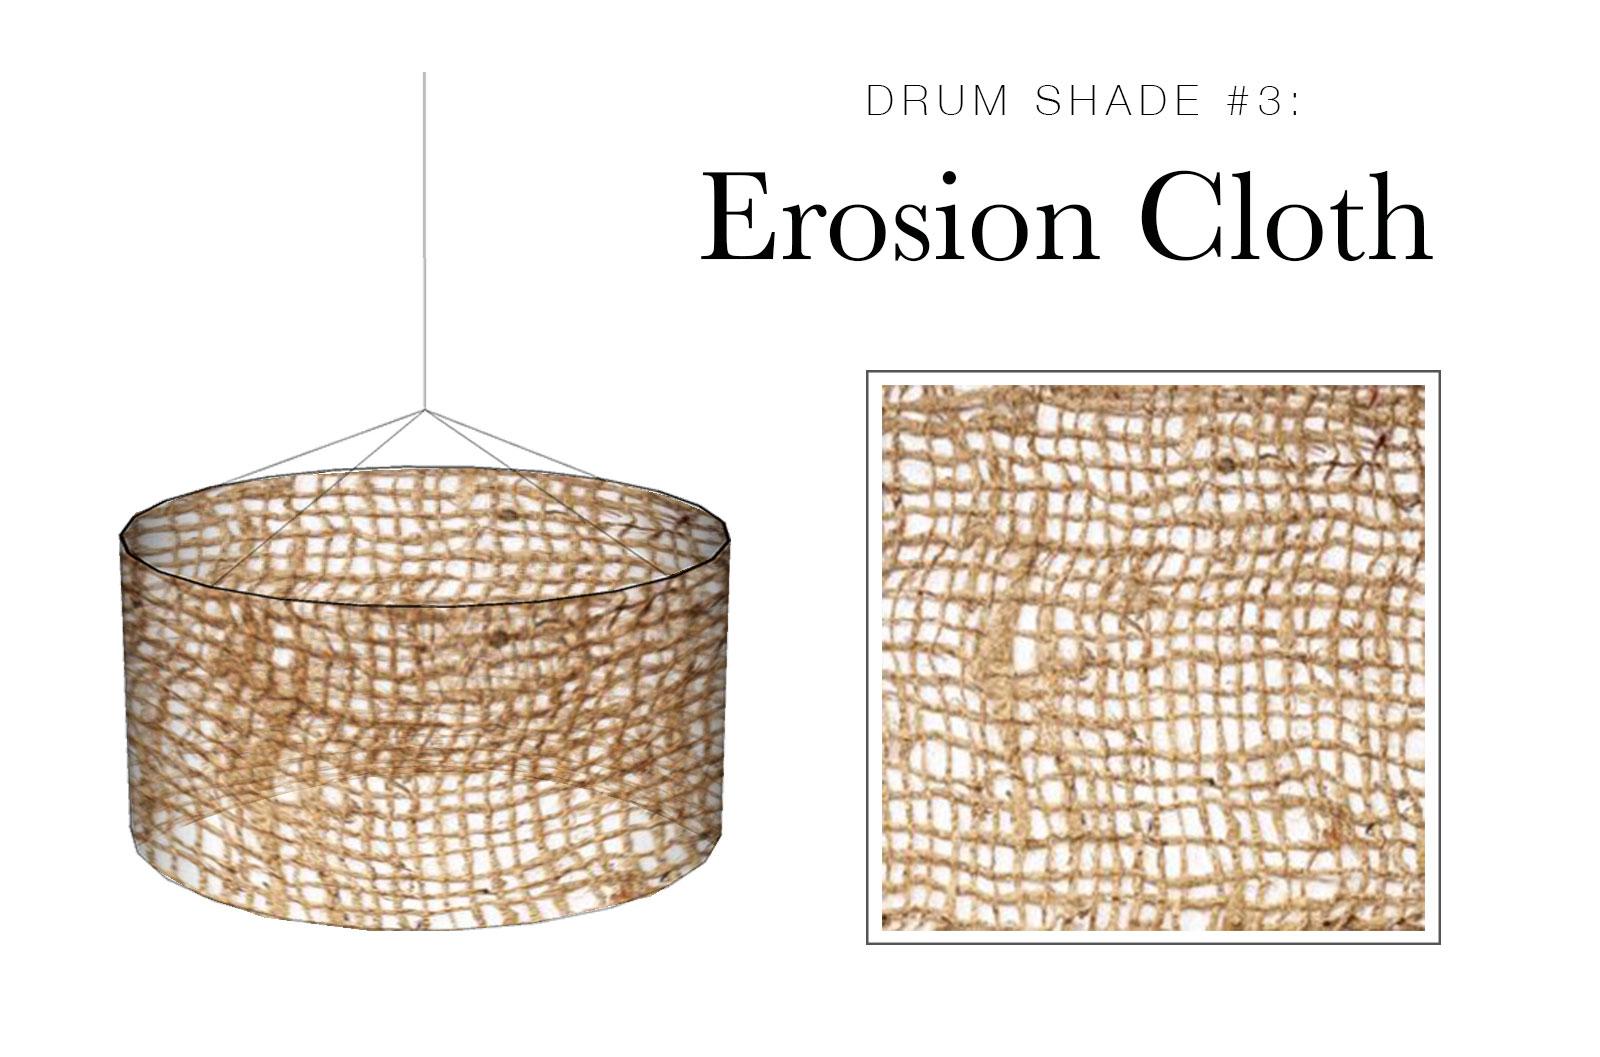 Drum Shade #3: Erosion Cloth